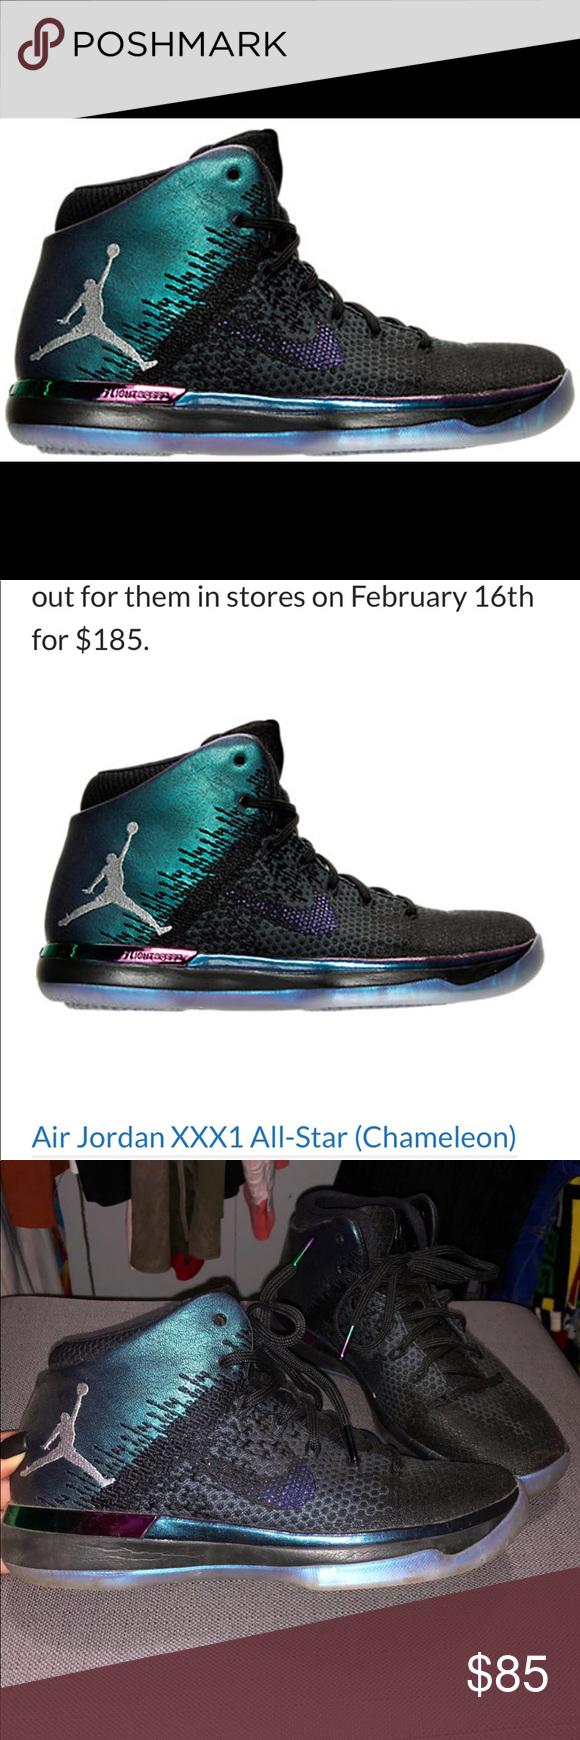 newest 4e42e 9c8a2 Air Jordan 31 Allstars chameleon Like new. Colorways Black ...